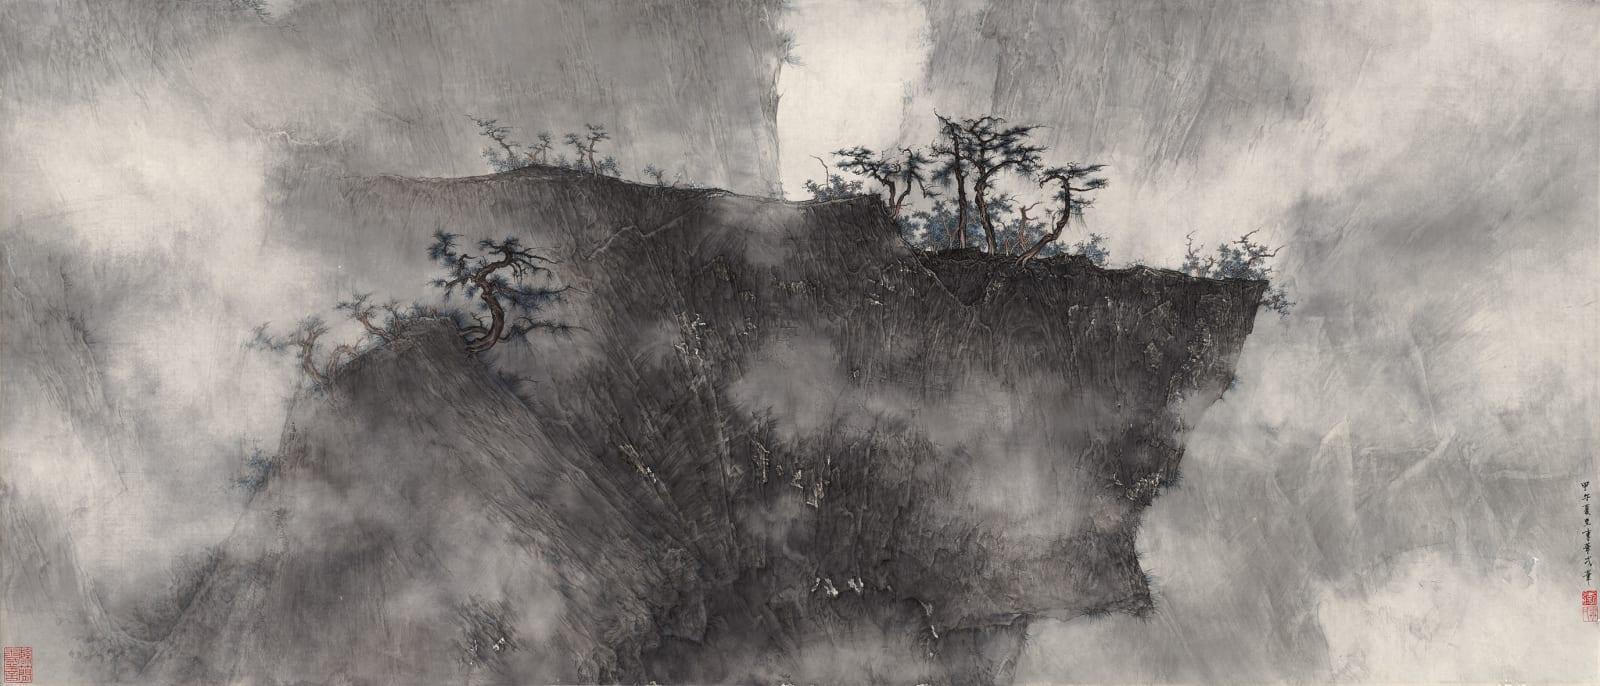 Li Huayi 李華弌, Landscape《山水》, 2014